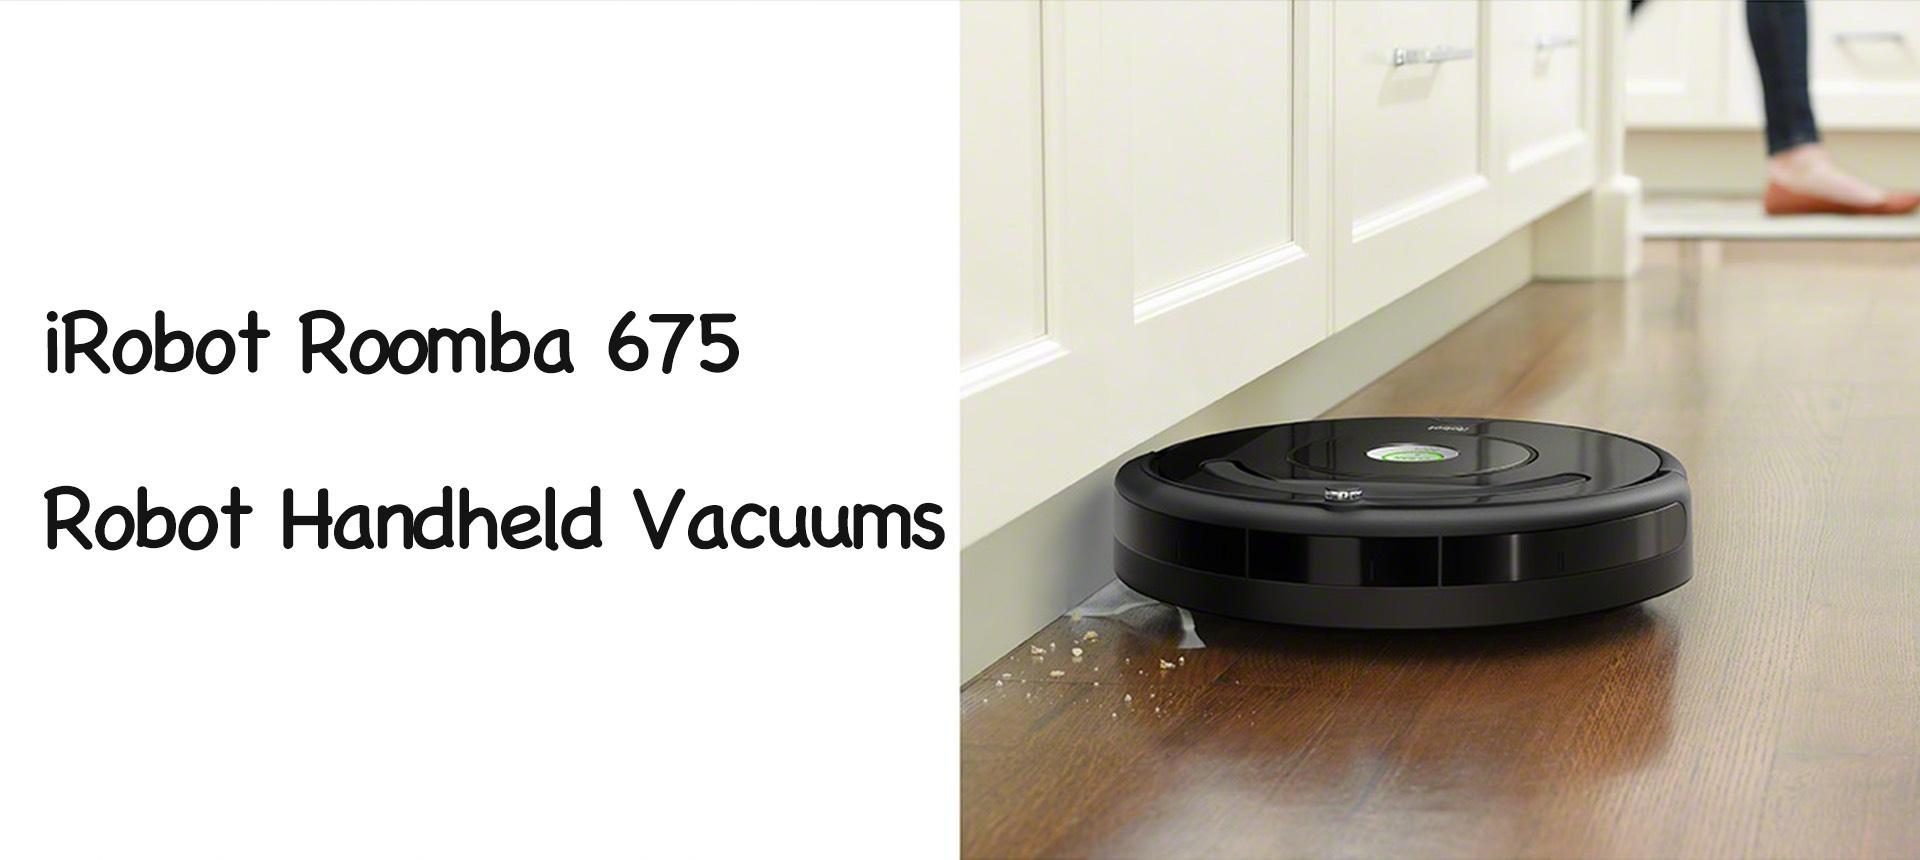 iRobot Roomba 675 Robot Handheld Vacuums